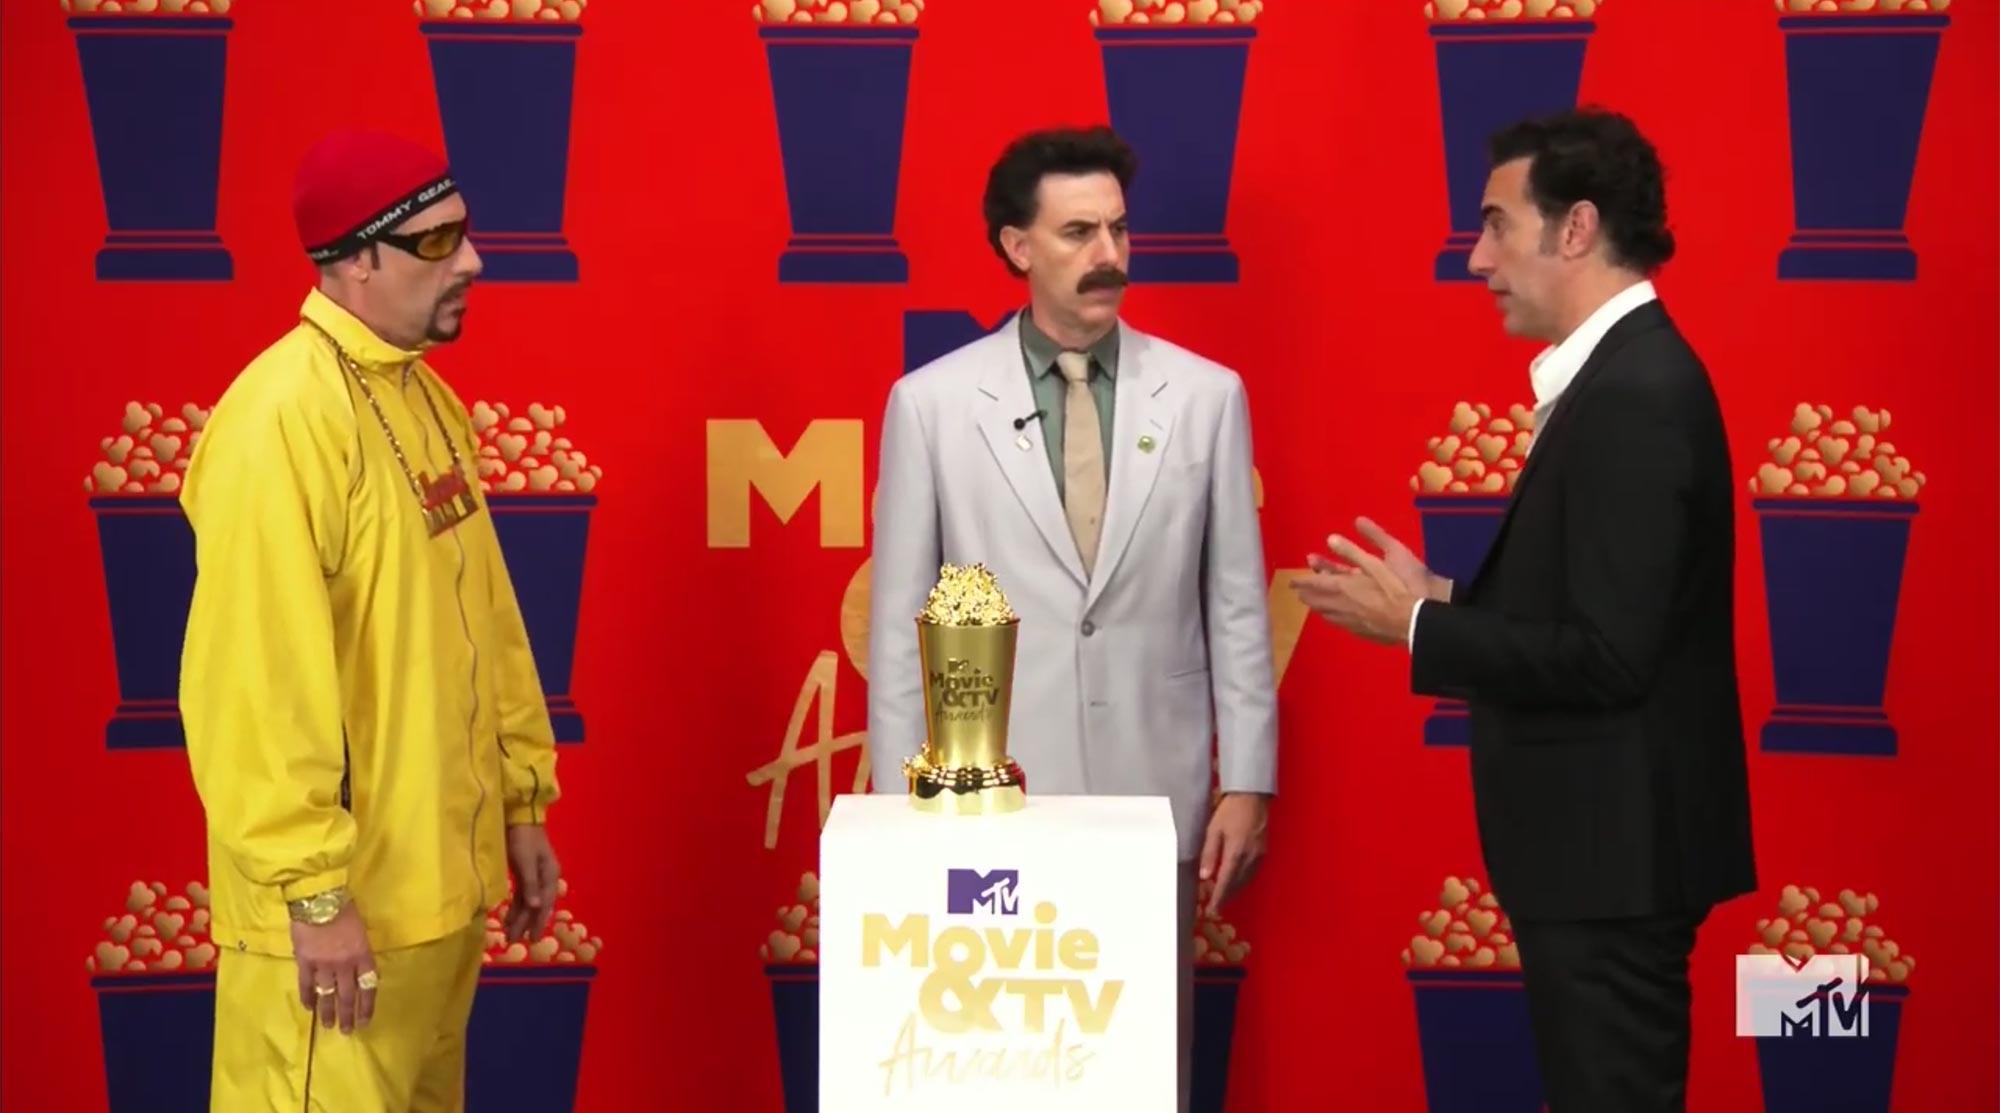 MTV Movie and TV Awards Ali G, Borat, Sacha Baron Cohen